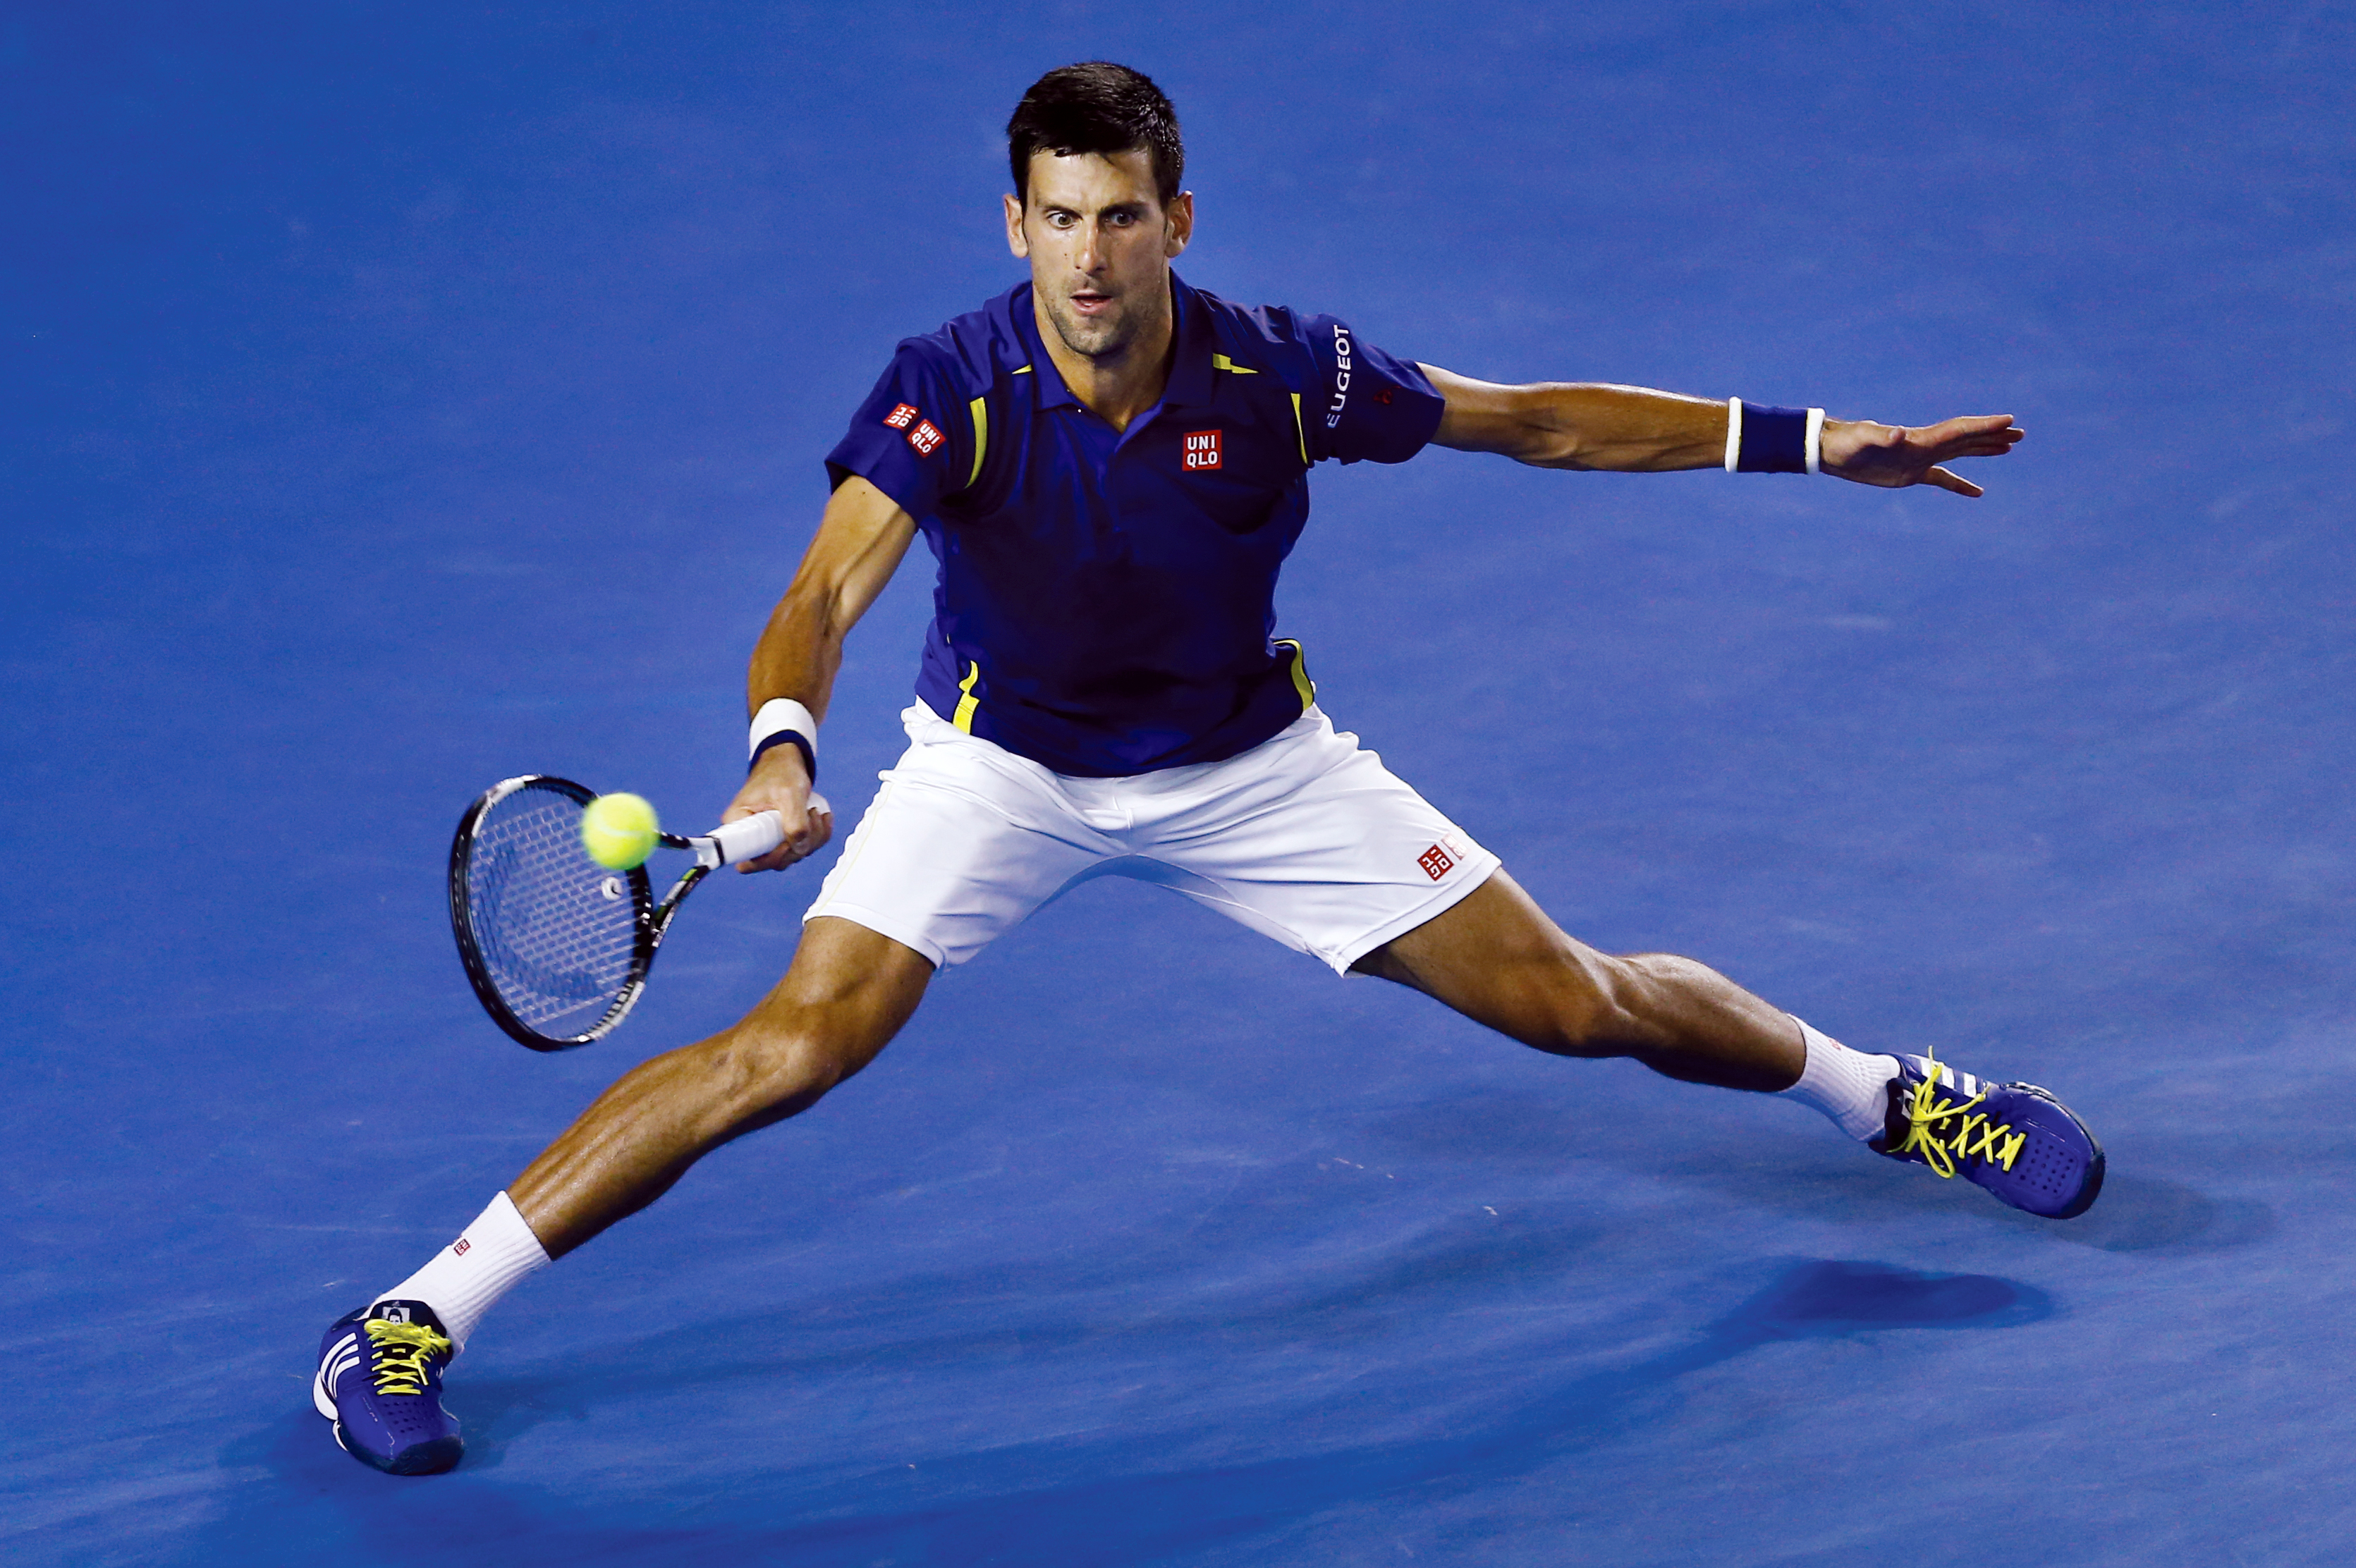 Novak Djokovic of Serbia plays a forehand return to Kei Nishikori of Japan during their quarterfinal match at the Australian Open tennis championships in Melbourne, Australia, Tuesday, Jan. 26, 2016.(AP Photo/Rafiq Maqbool)